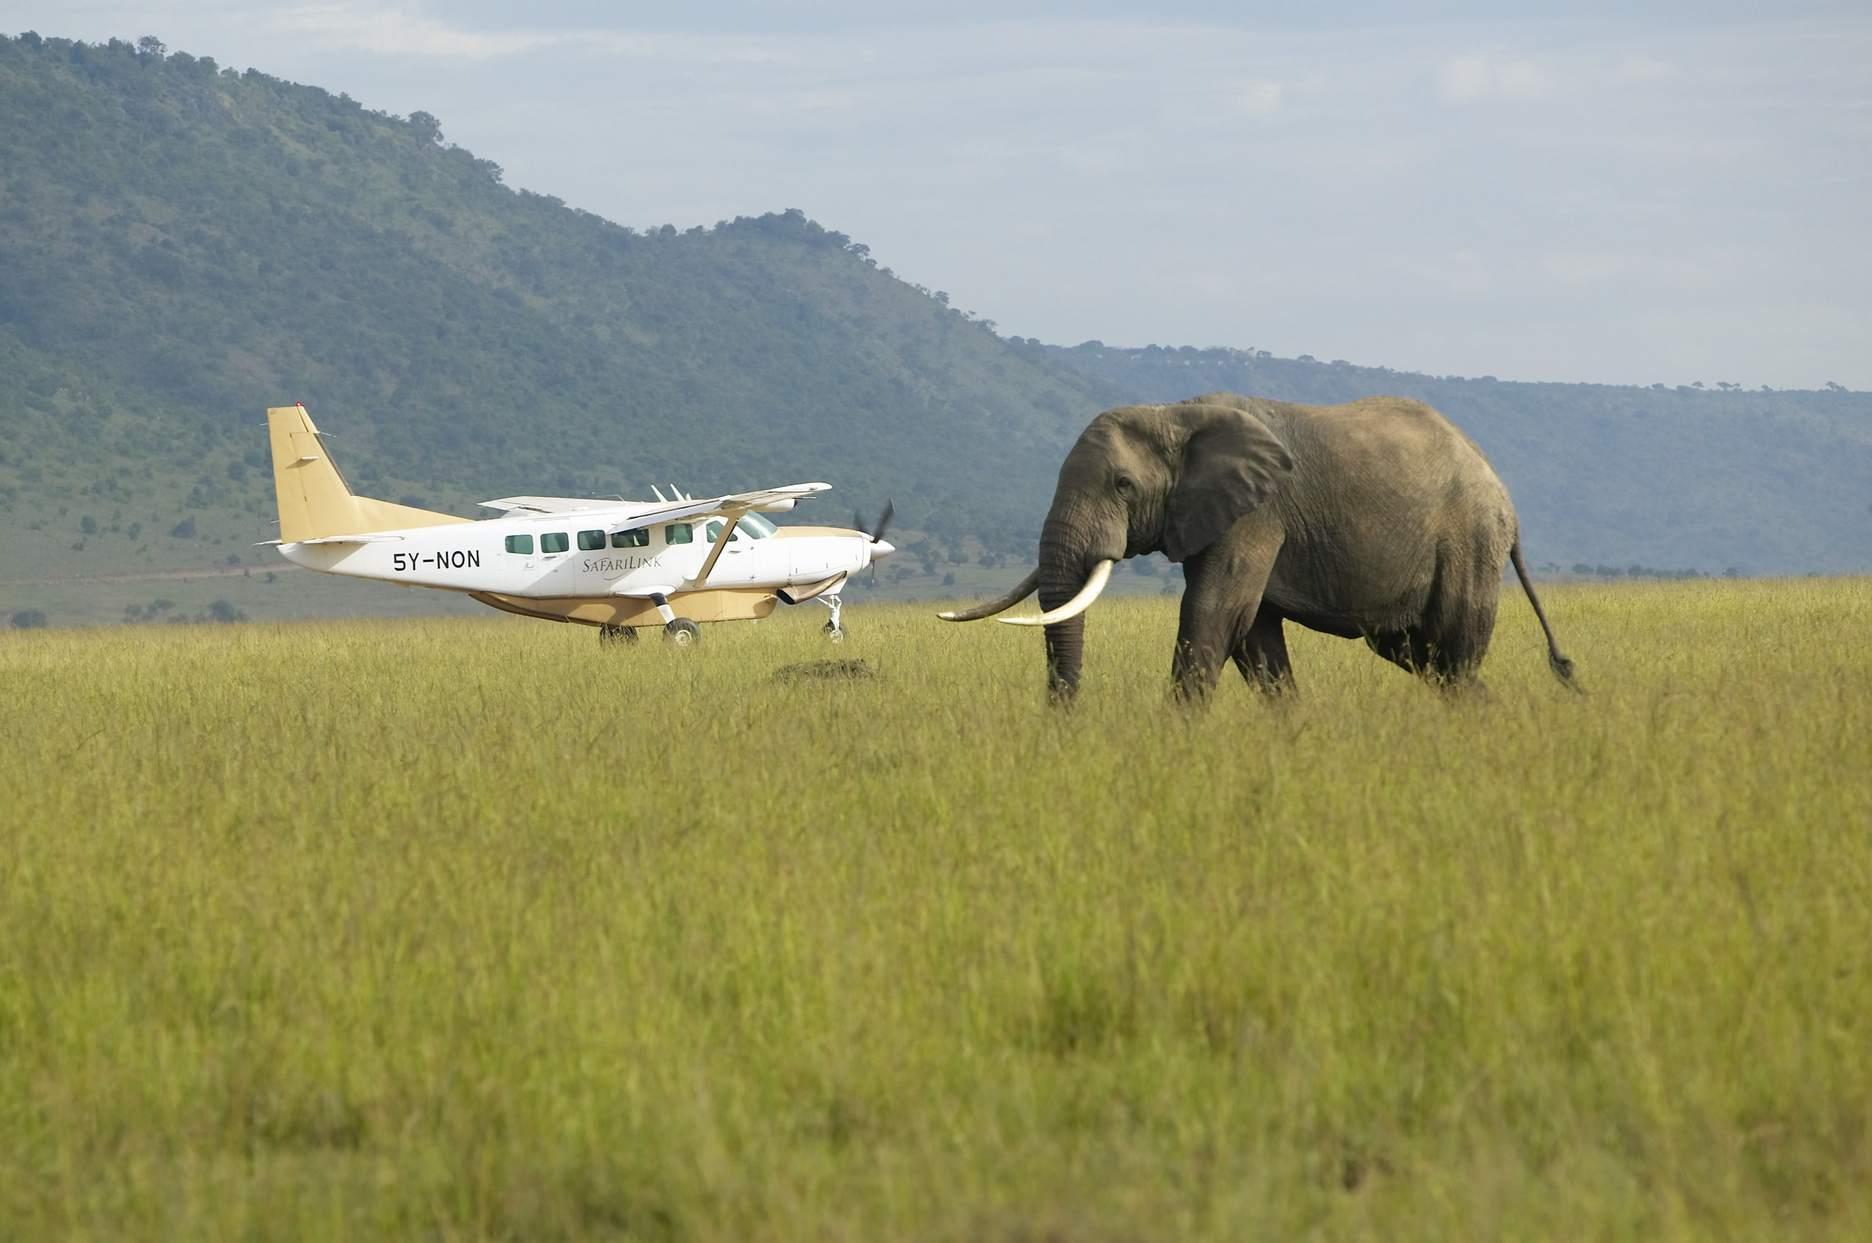 Elephant with airplane, Kenya